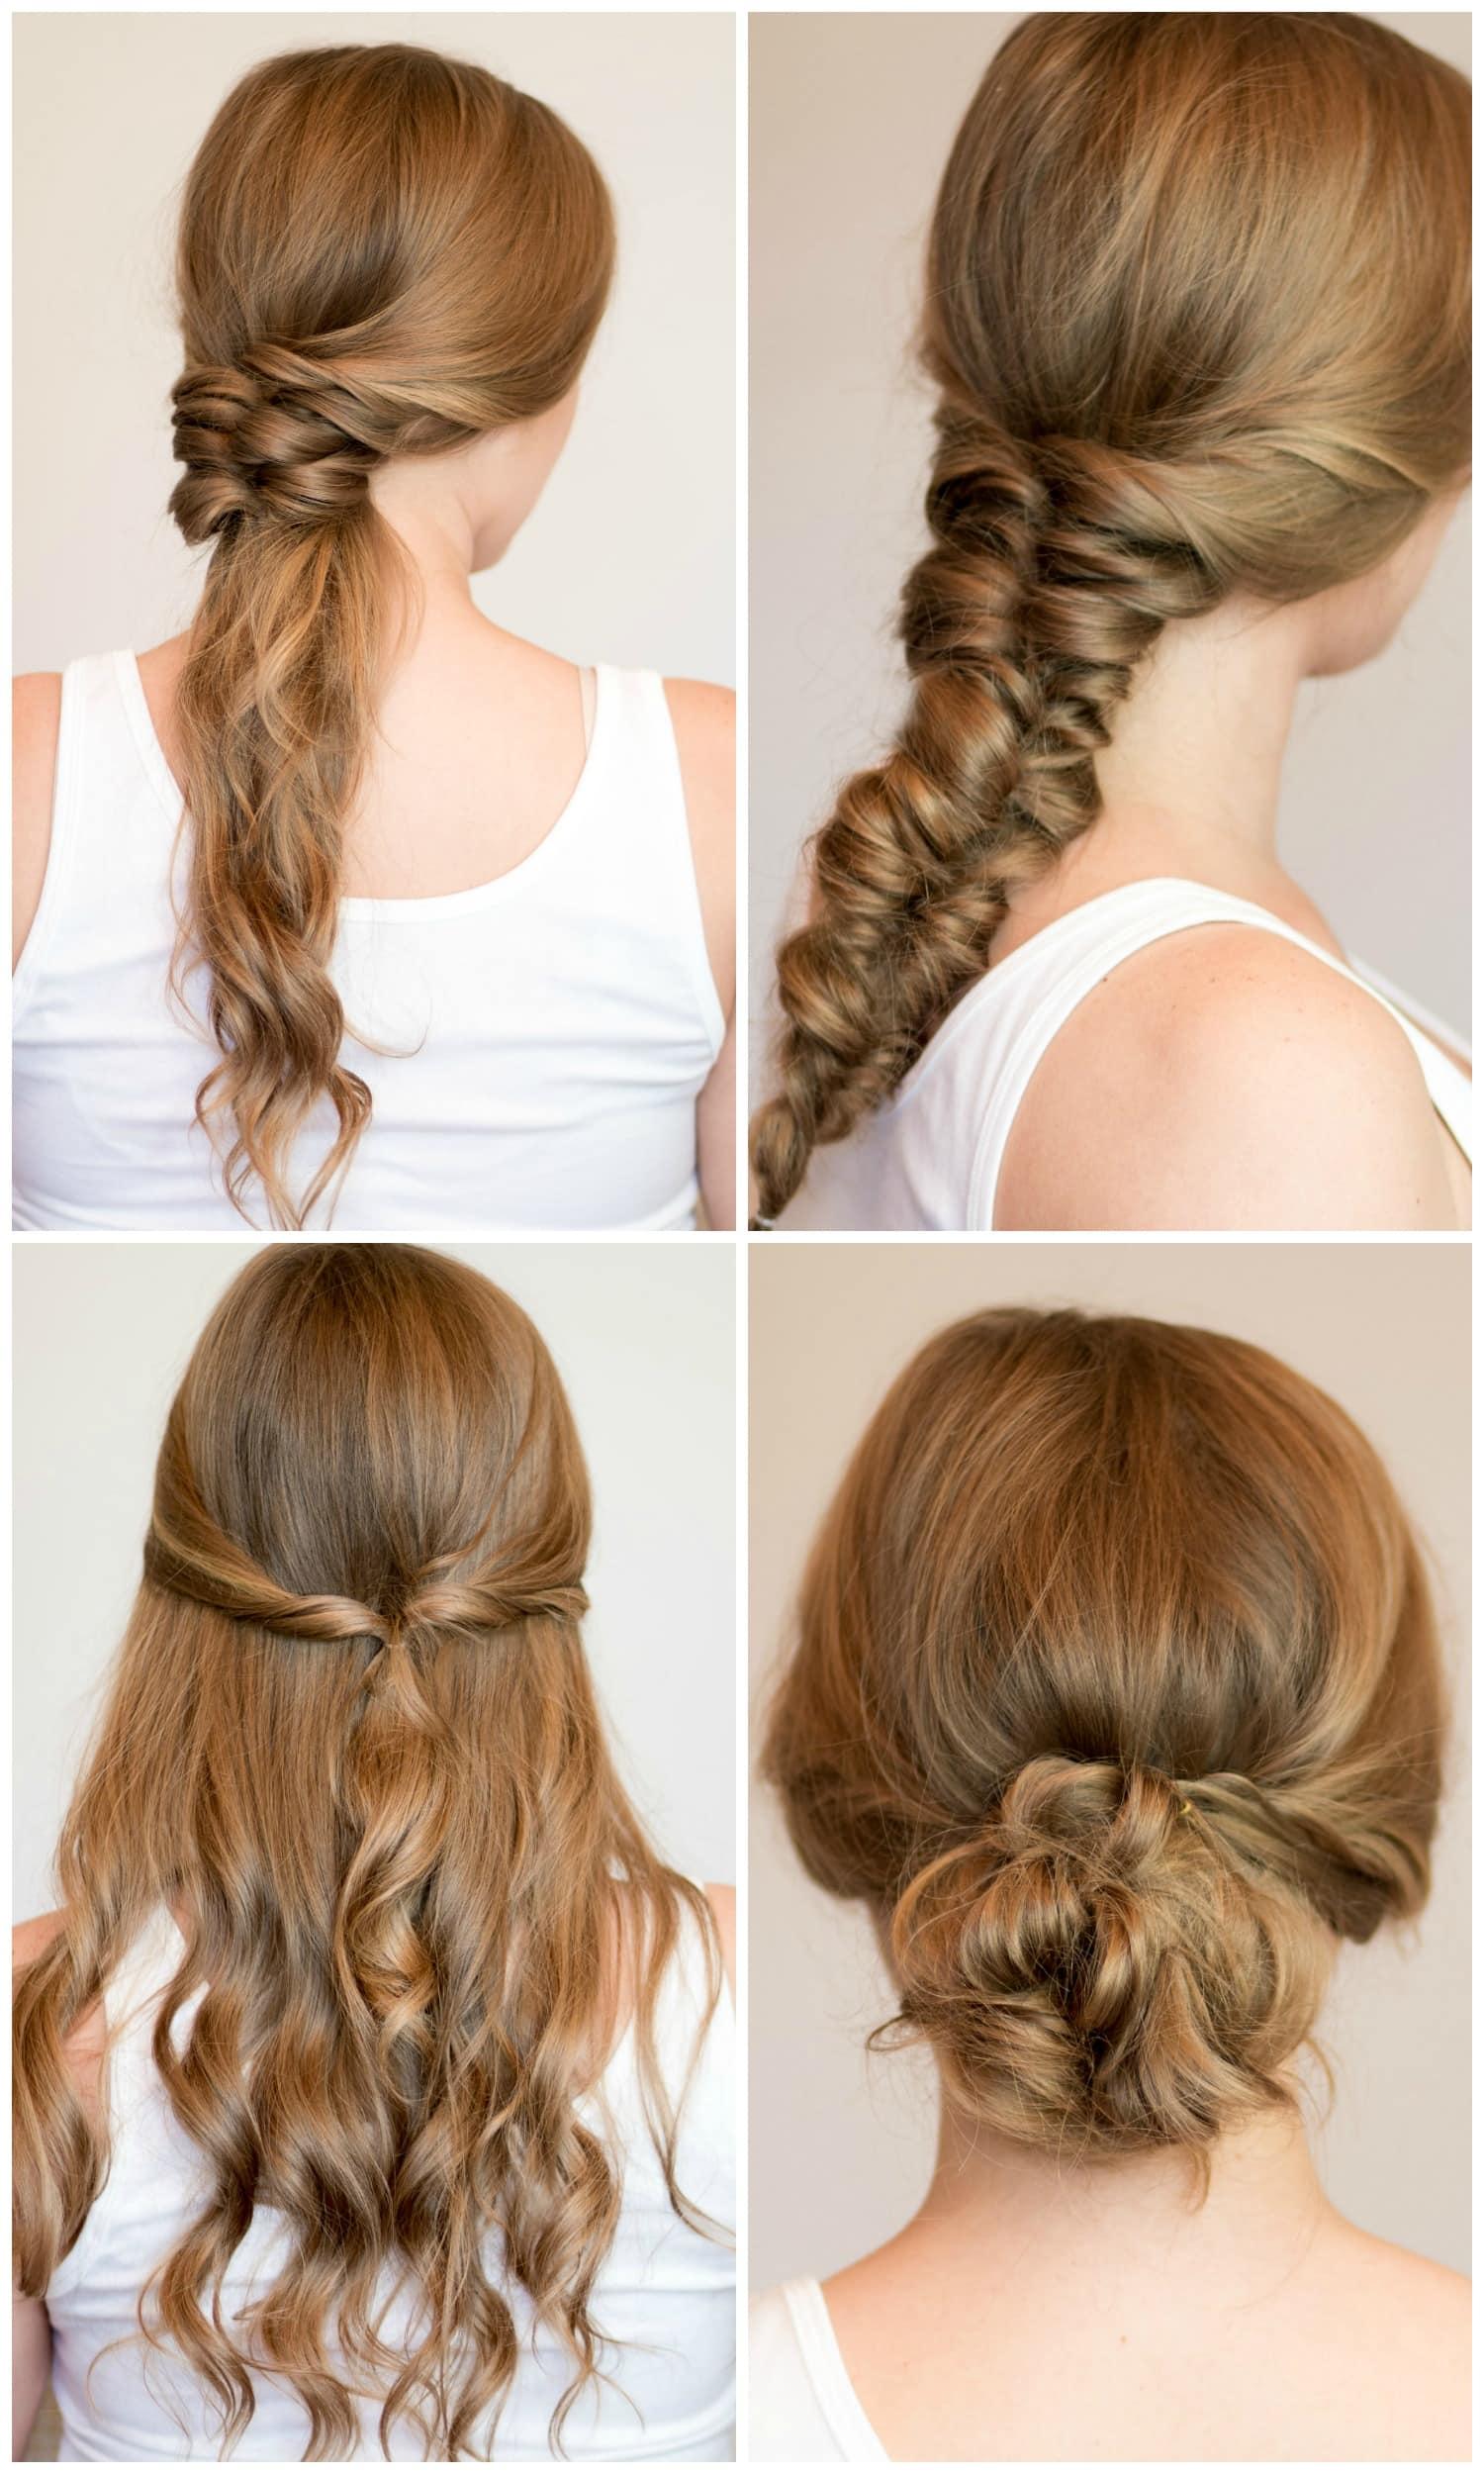 Easy Heatless Hairstyles for Long Hair  Ashley Brooke Nicholas